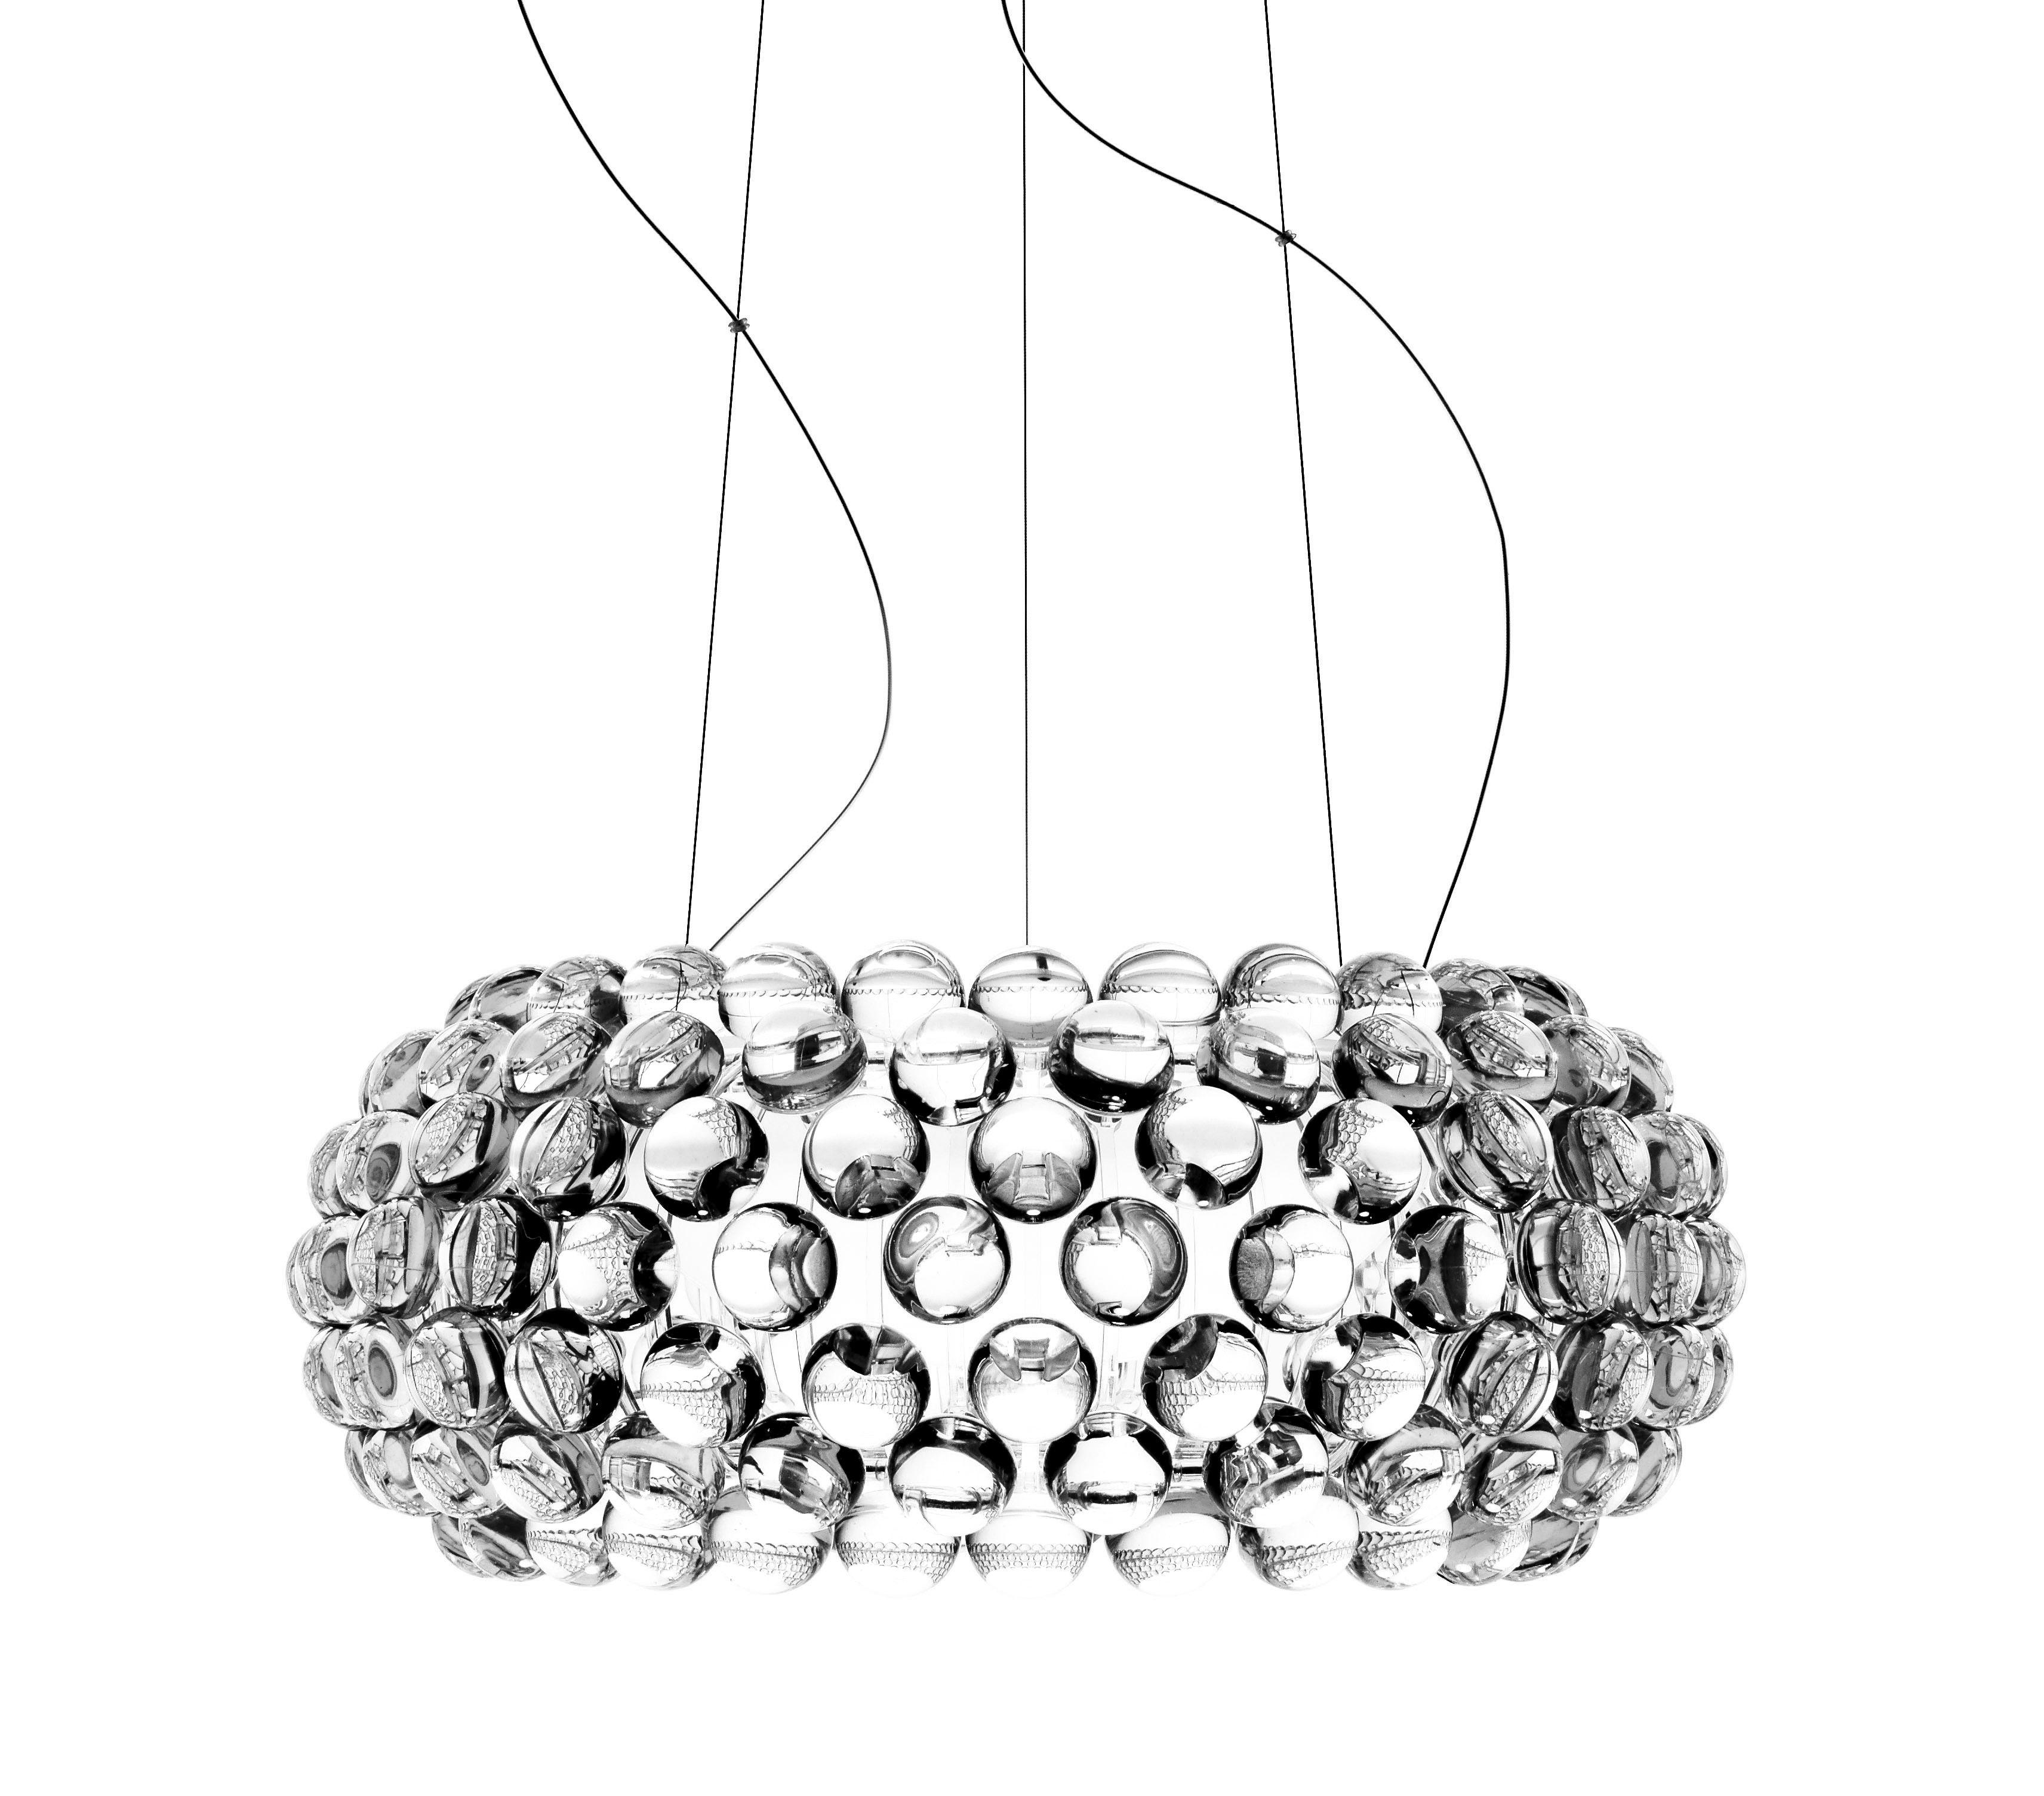 Ø Transparent x 20 Suspension LED h Caboche 50 Media Foscarini TlJFK1c